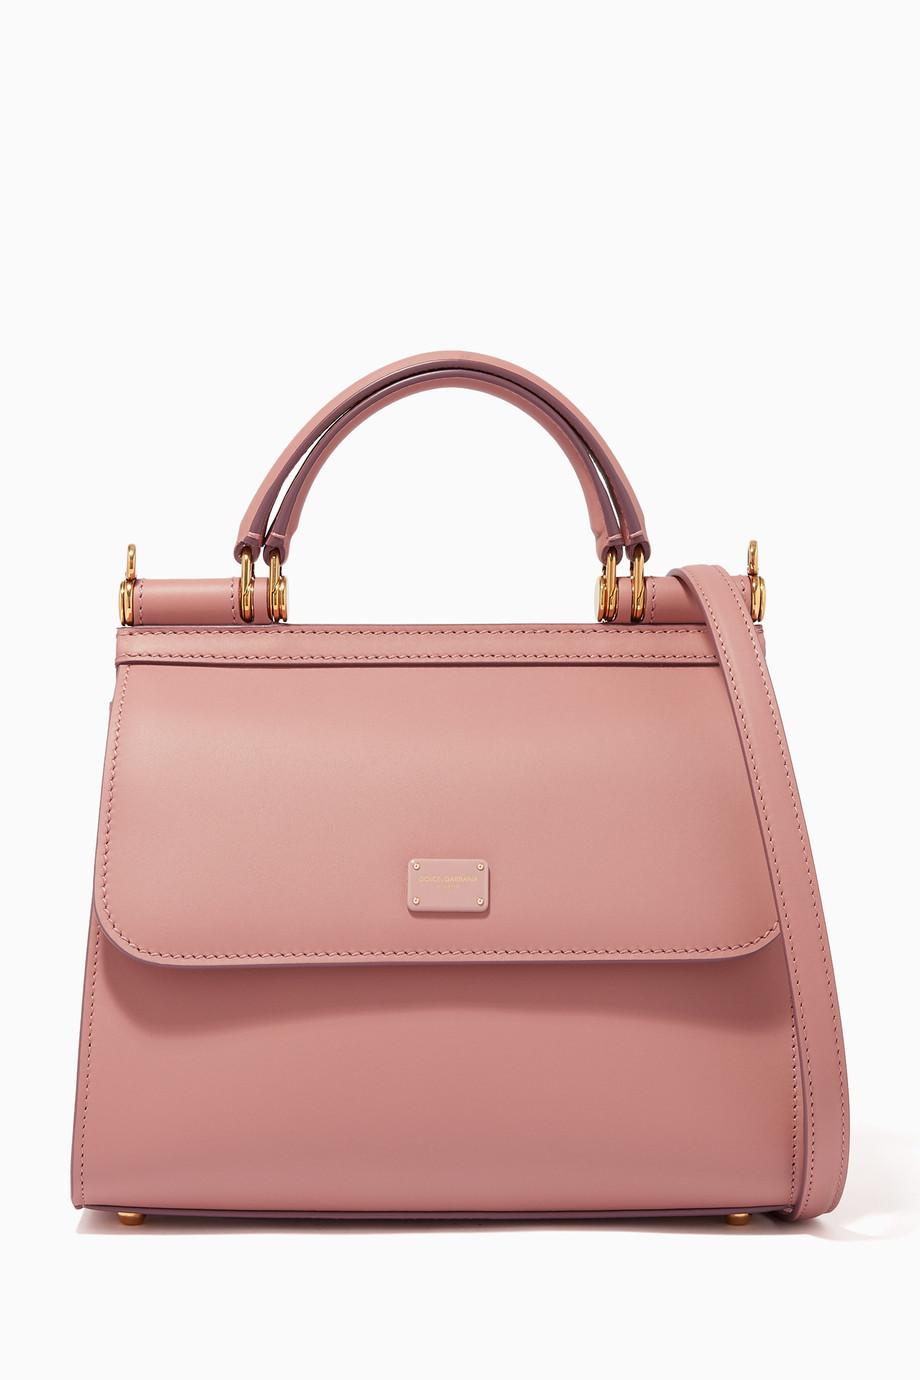 548c6ebc191 Shop Dolce & Gabbana Pink Sicily 58 Small Calfskin Bag for Women ...